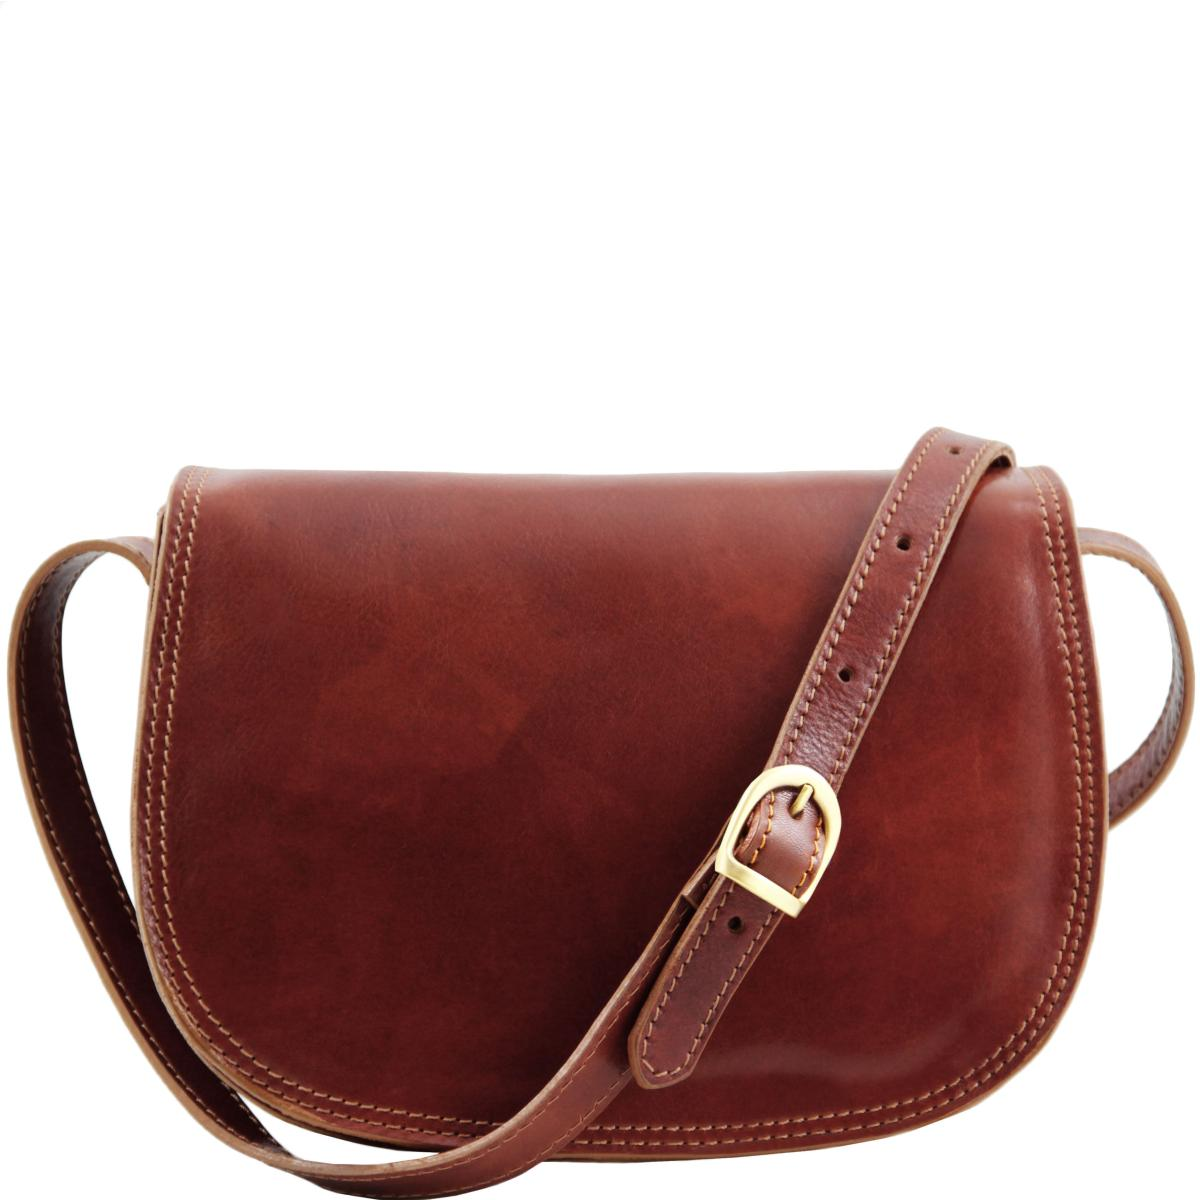 Sac Bandoulière Cuir Femme Marron -Tuscany Leather-